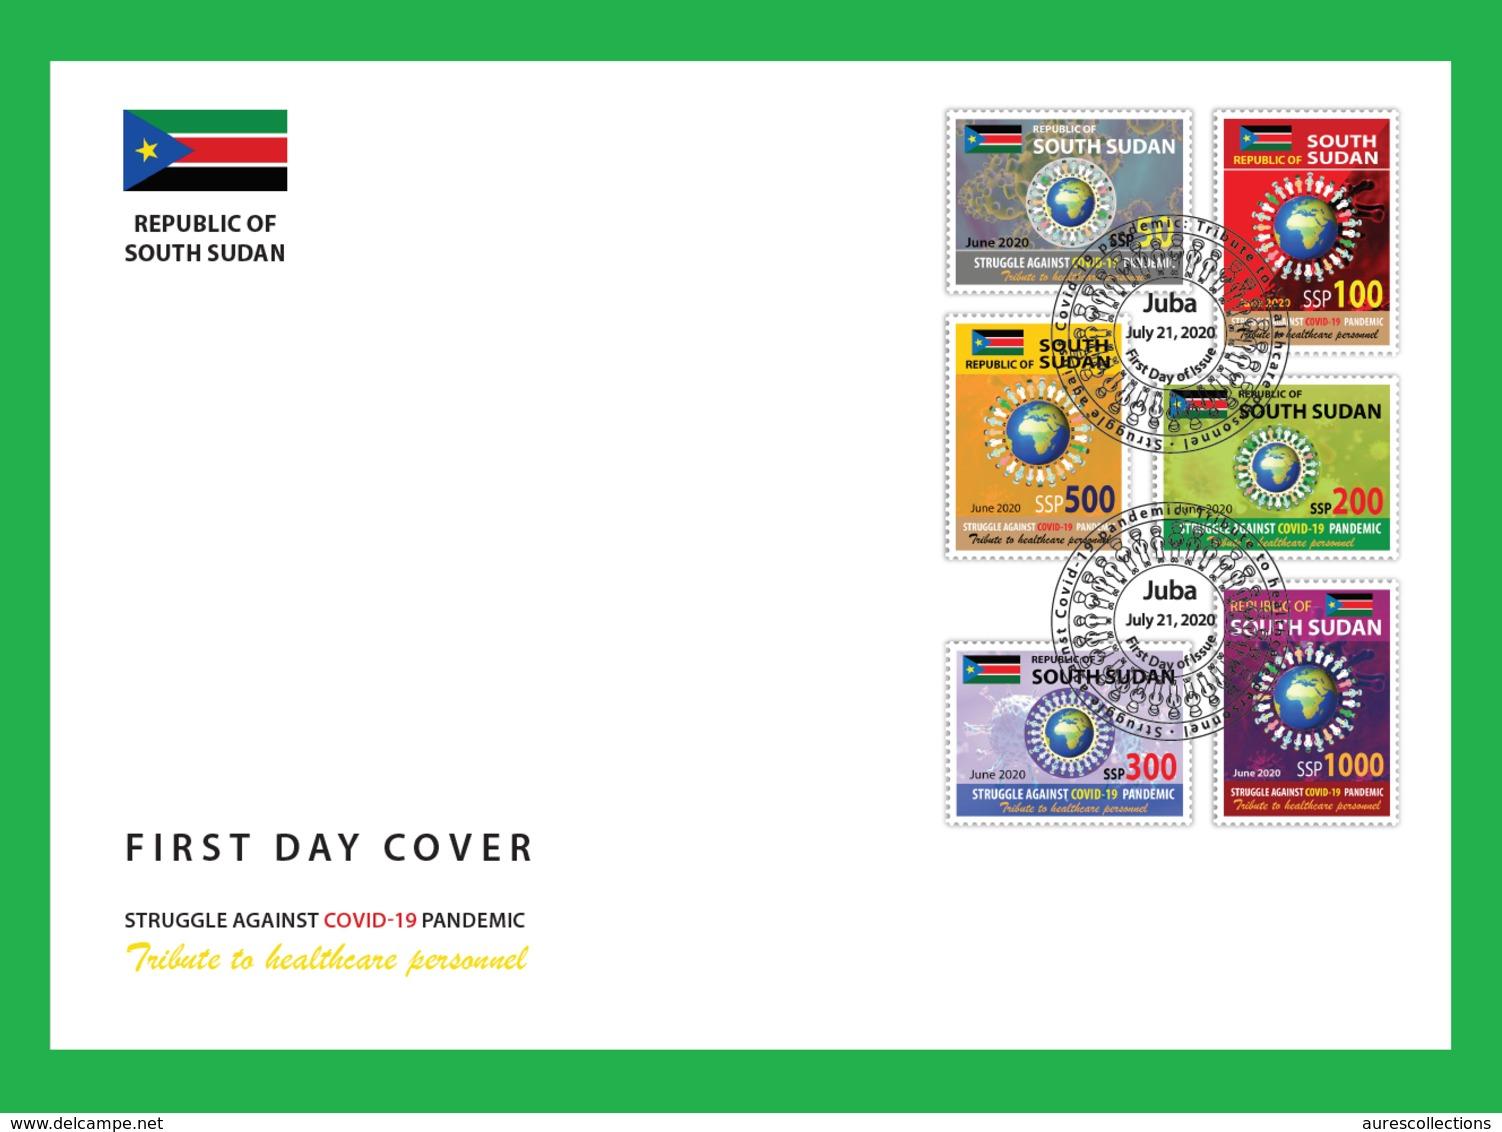 SOUTH SUDAN 2020 - FDC - JOINT ISSUE - COVID-19 PANDEMIC PANDEMIE CORONA CORONAVIRUS - RARE - Gemeinschaftsausgaben